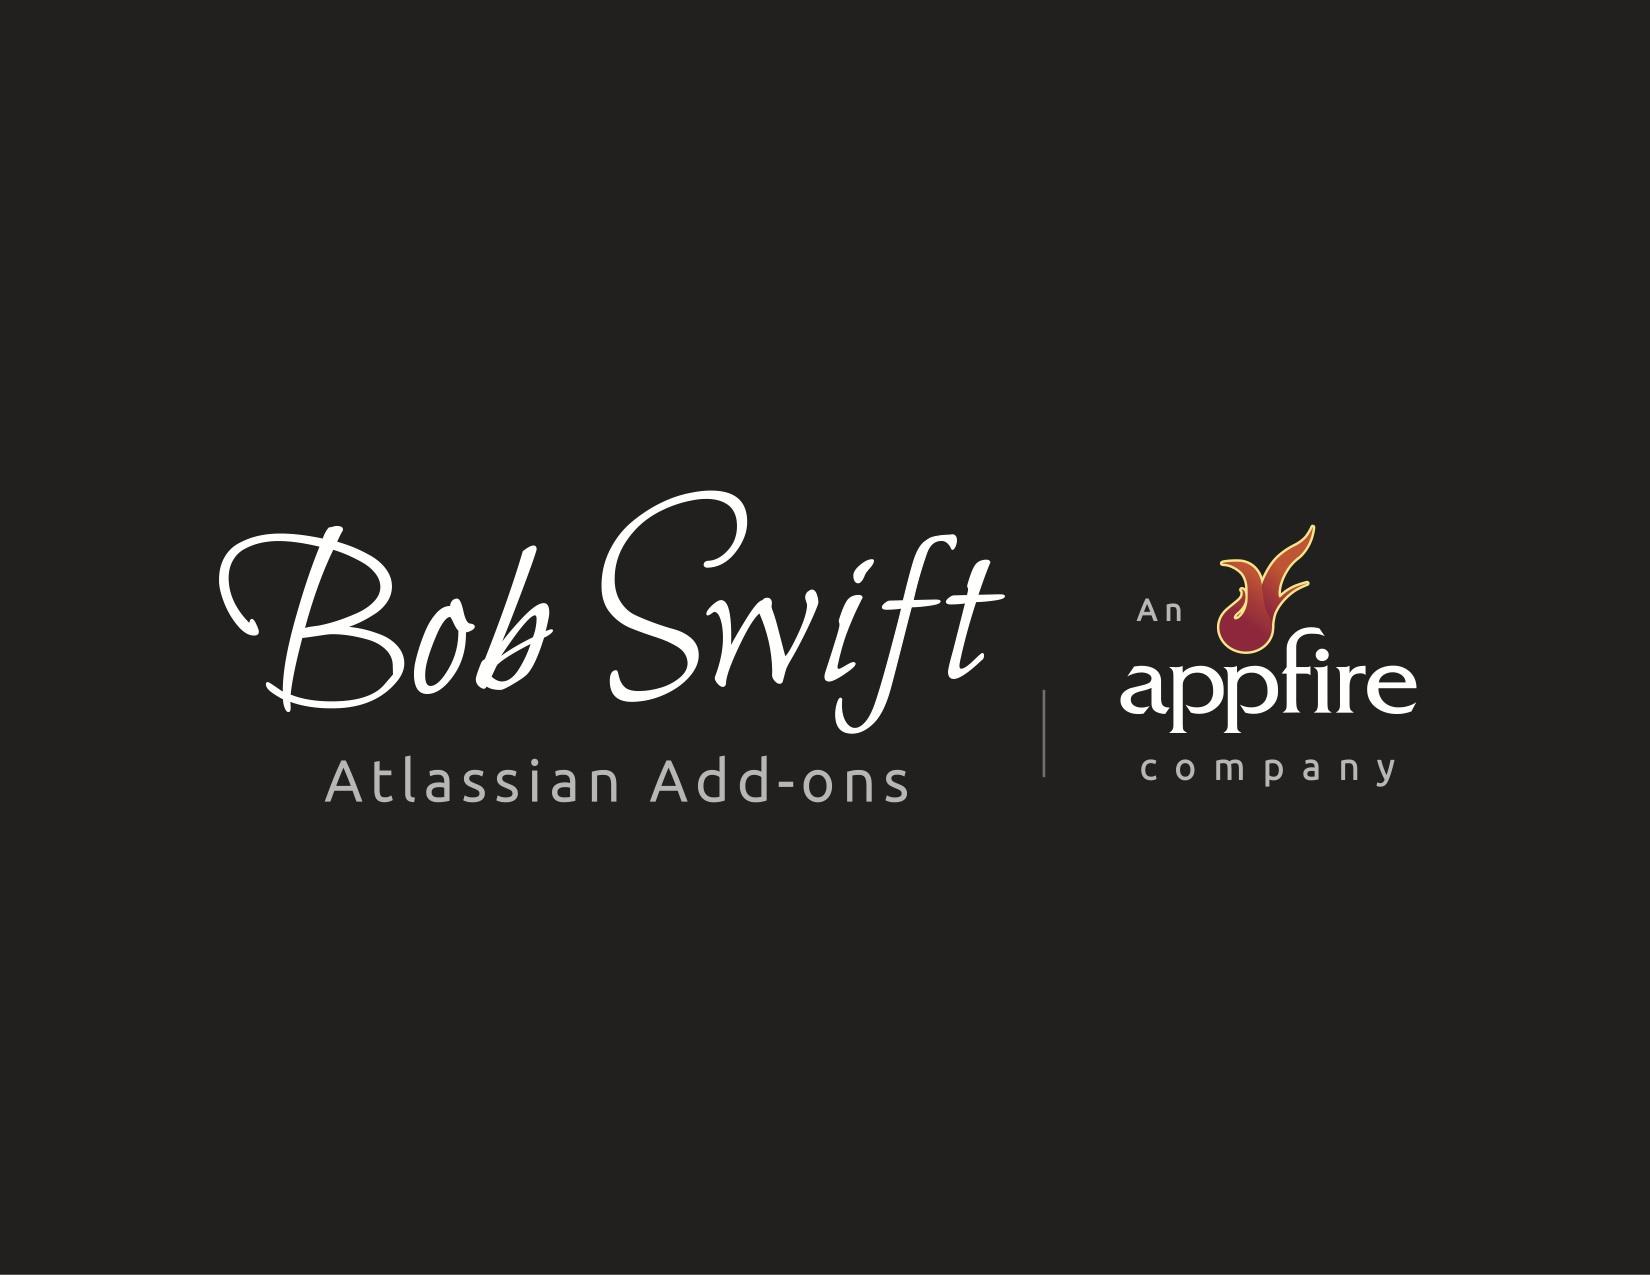 appfirebob